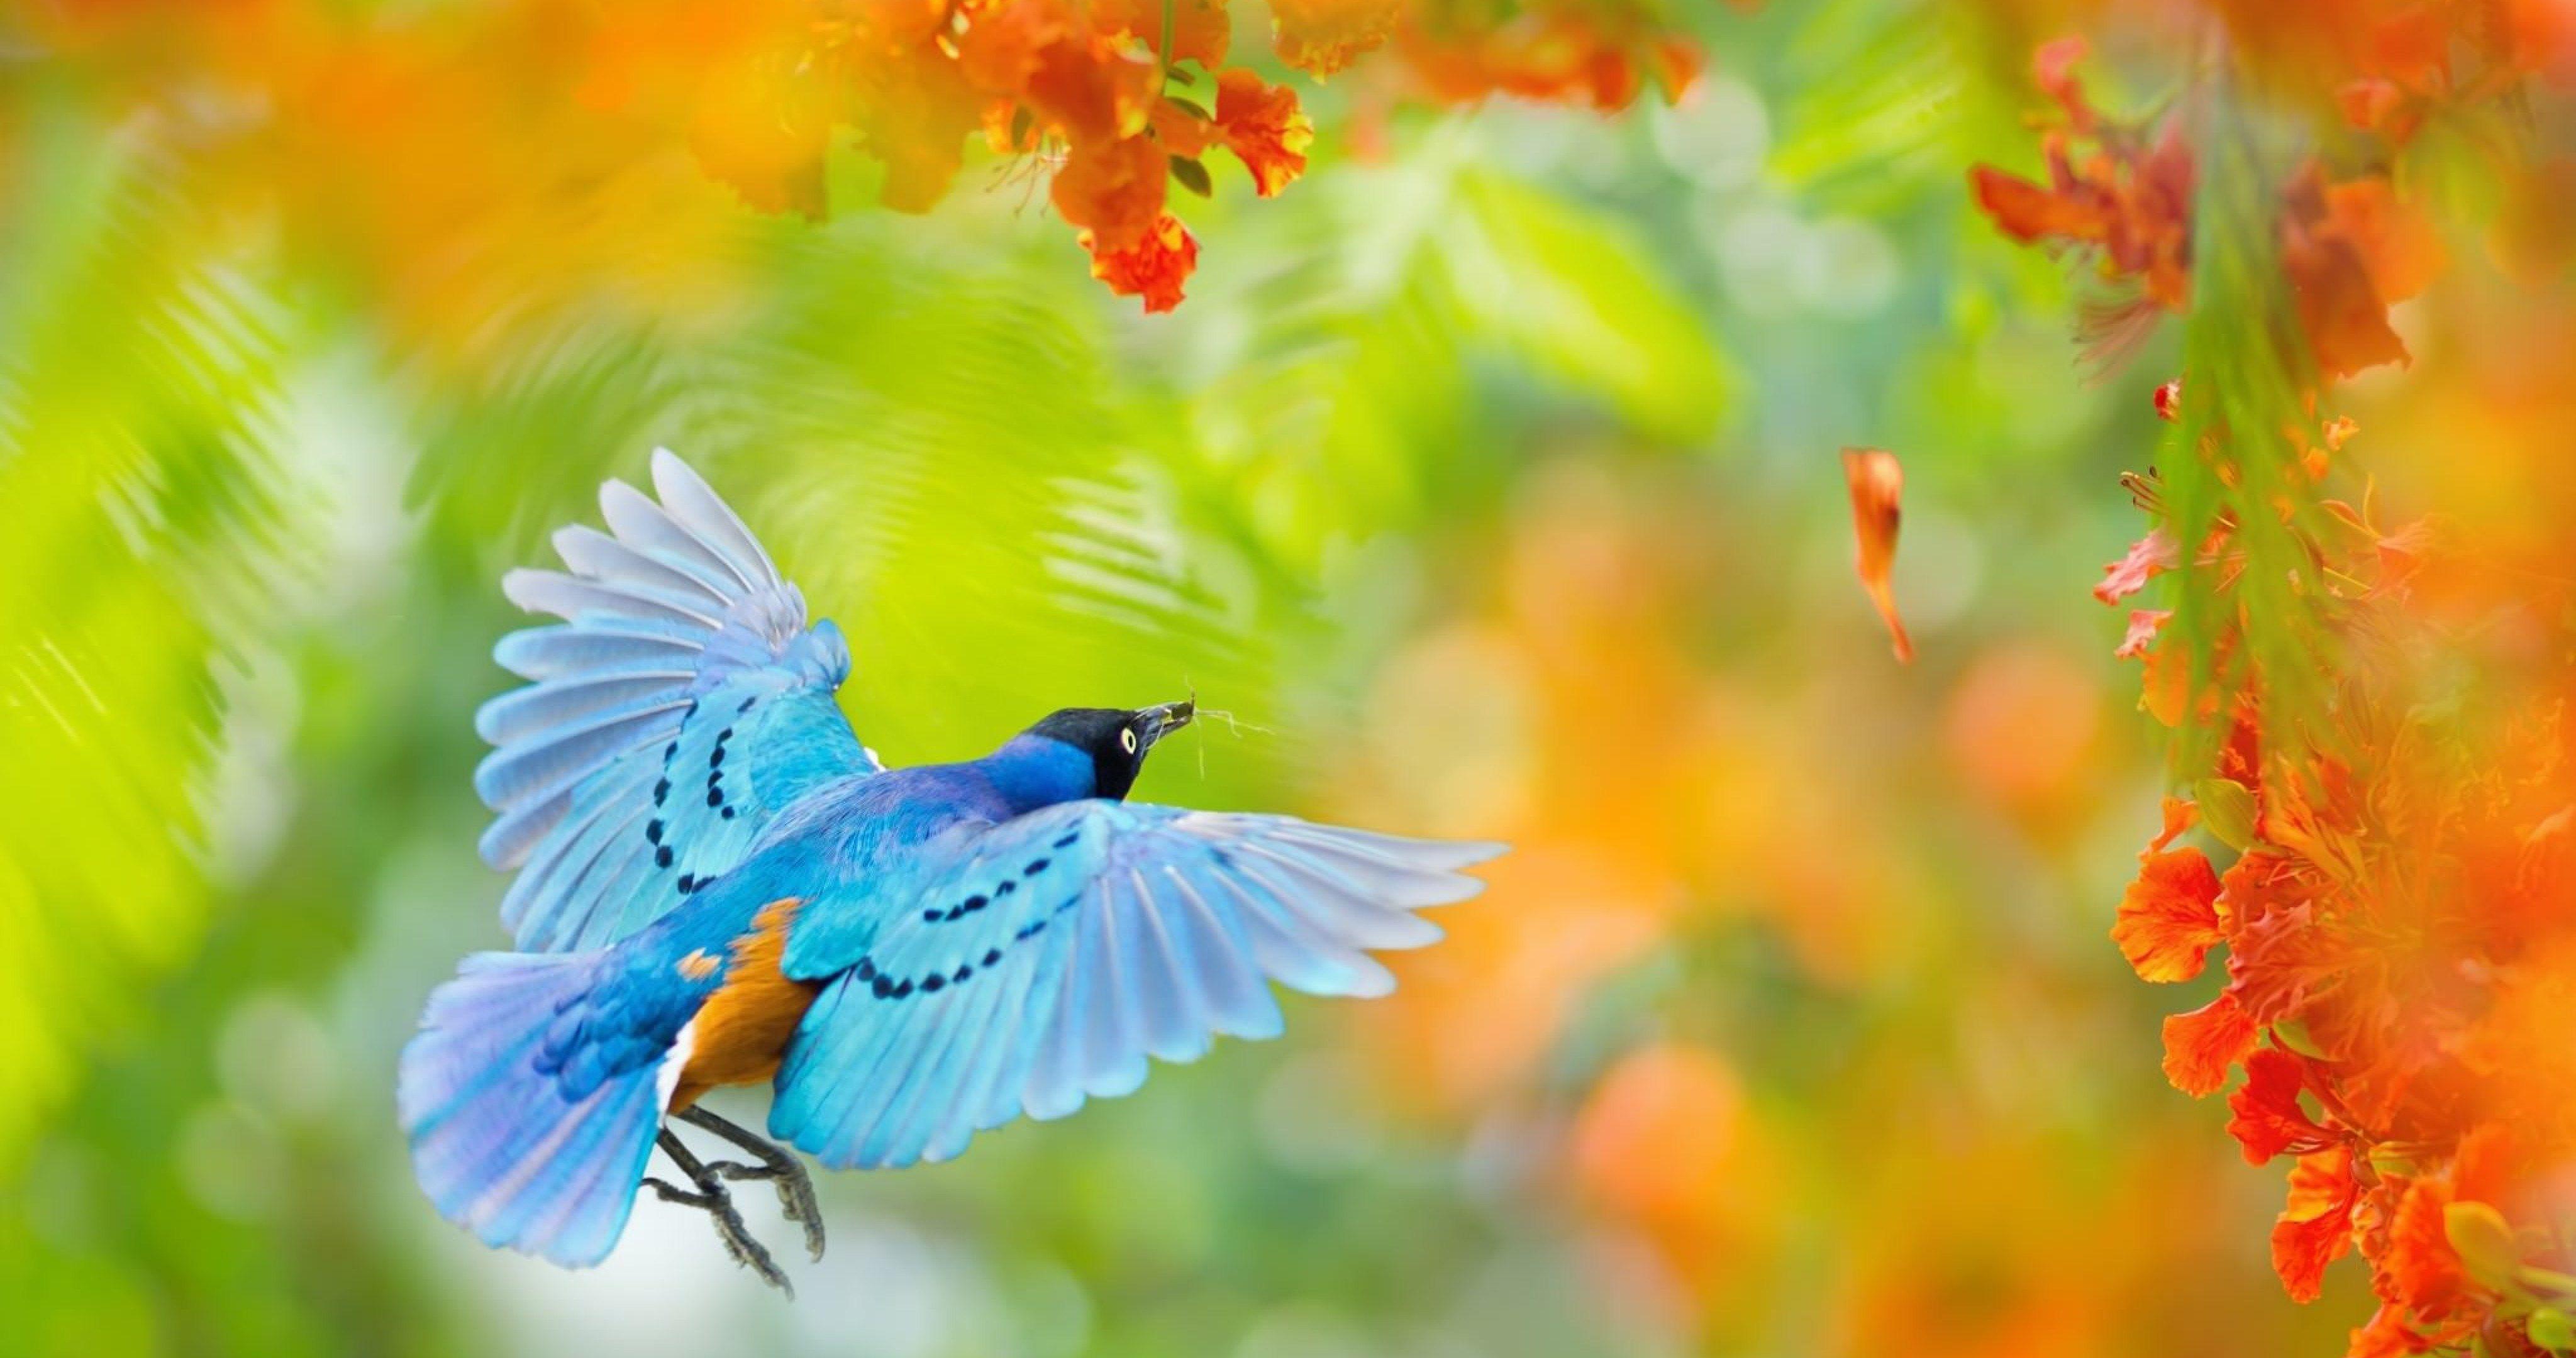 Flying Bird In Africa 4k Ultra Hd Wallpaper Birds Flying Beautiful Birds Birds